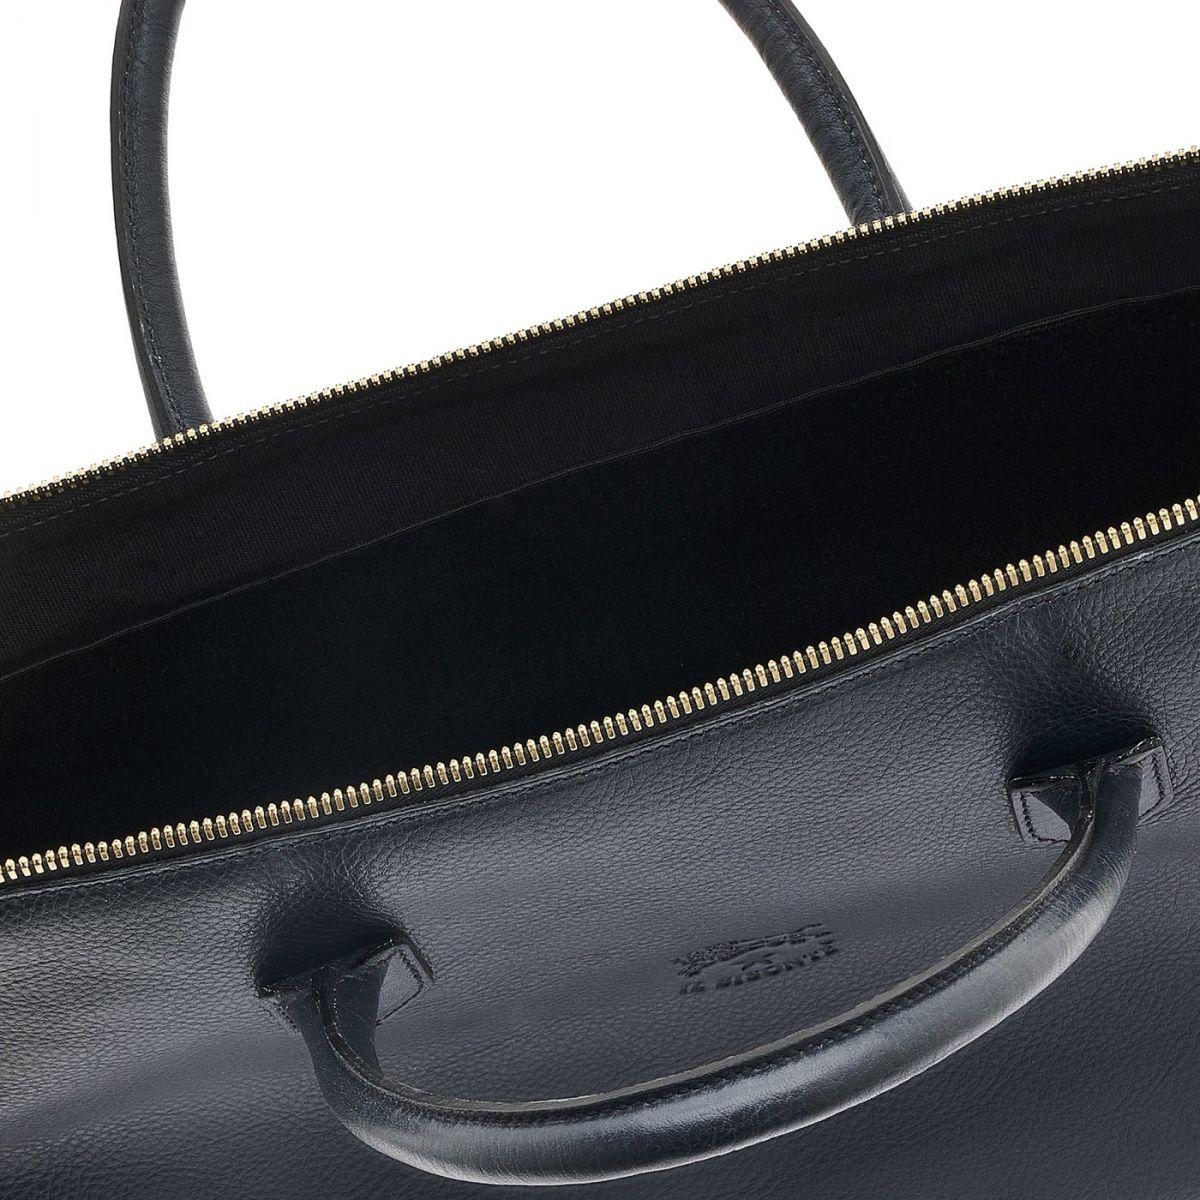 Briefcase in Cowhide Double Leather color Blue - Michelangelo line BBC035 | Details